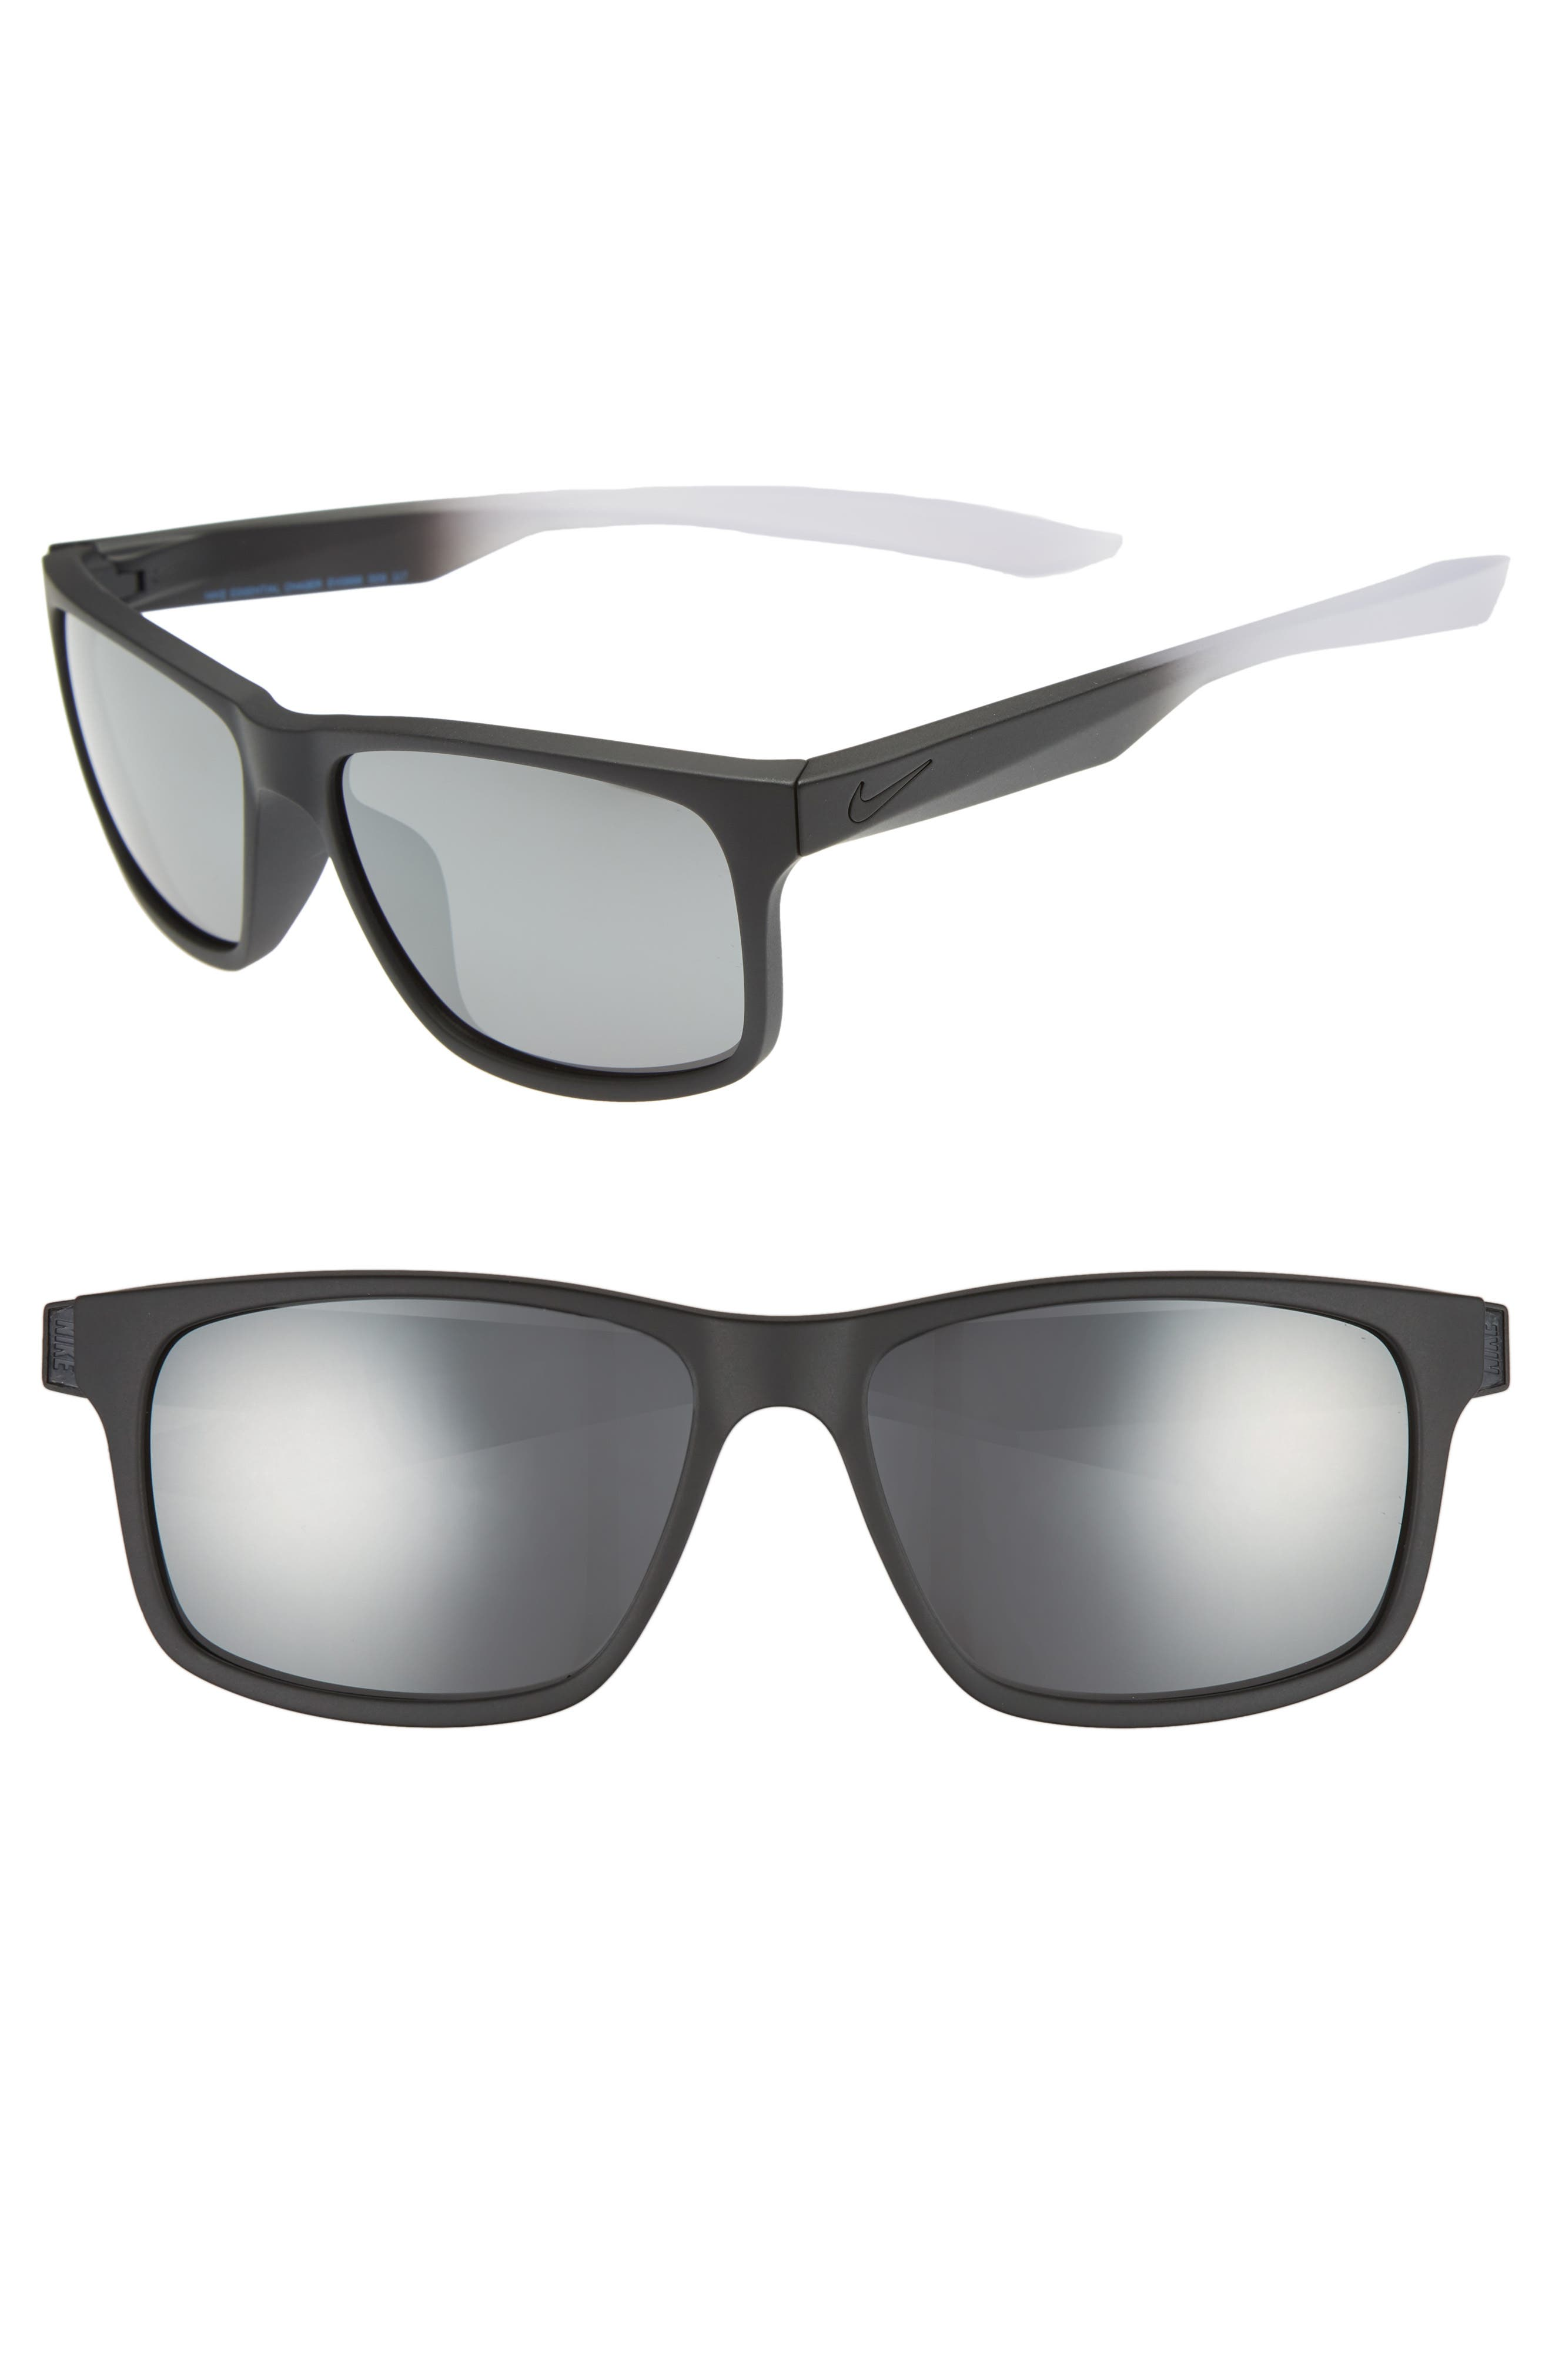 Nike Essential Chaser 5m Sunglasses - Matte Black/ Grey Silver Flash